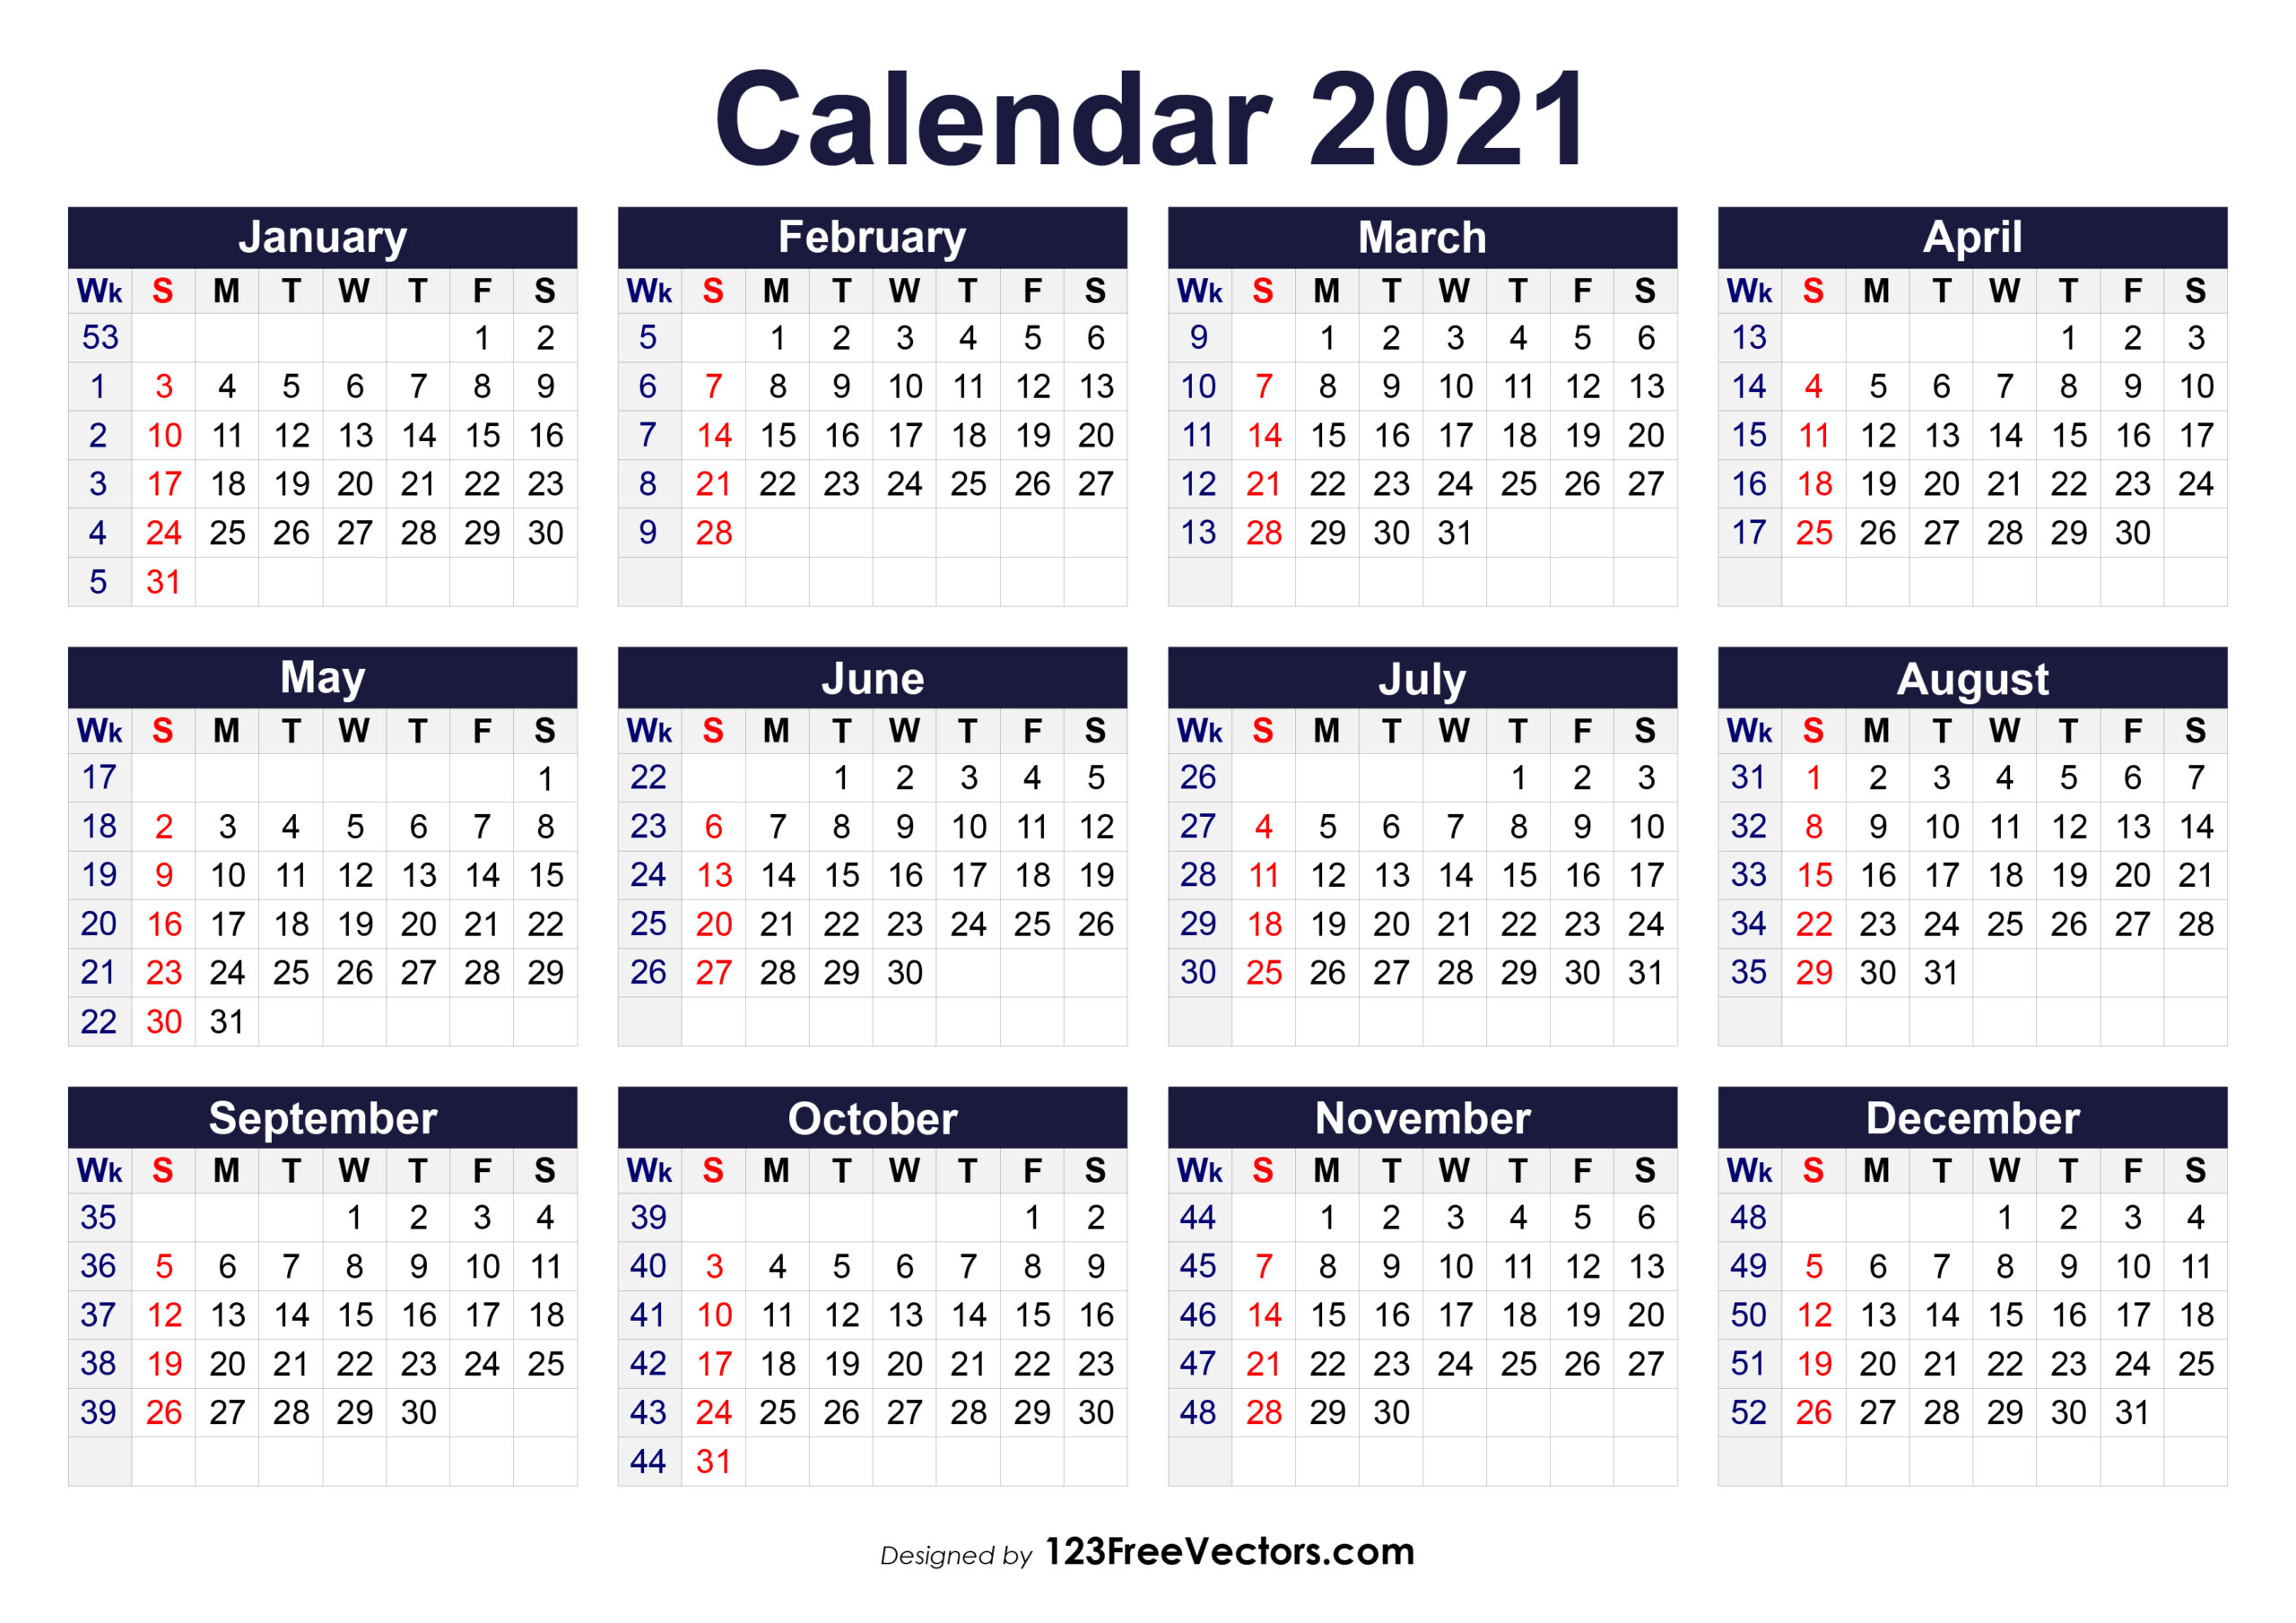 Free Printable 2021 Calendar With Week Numbers within Monthly Calendar By Week Number 2021